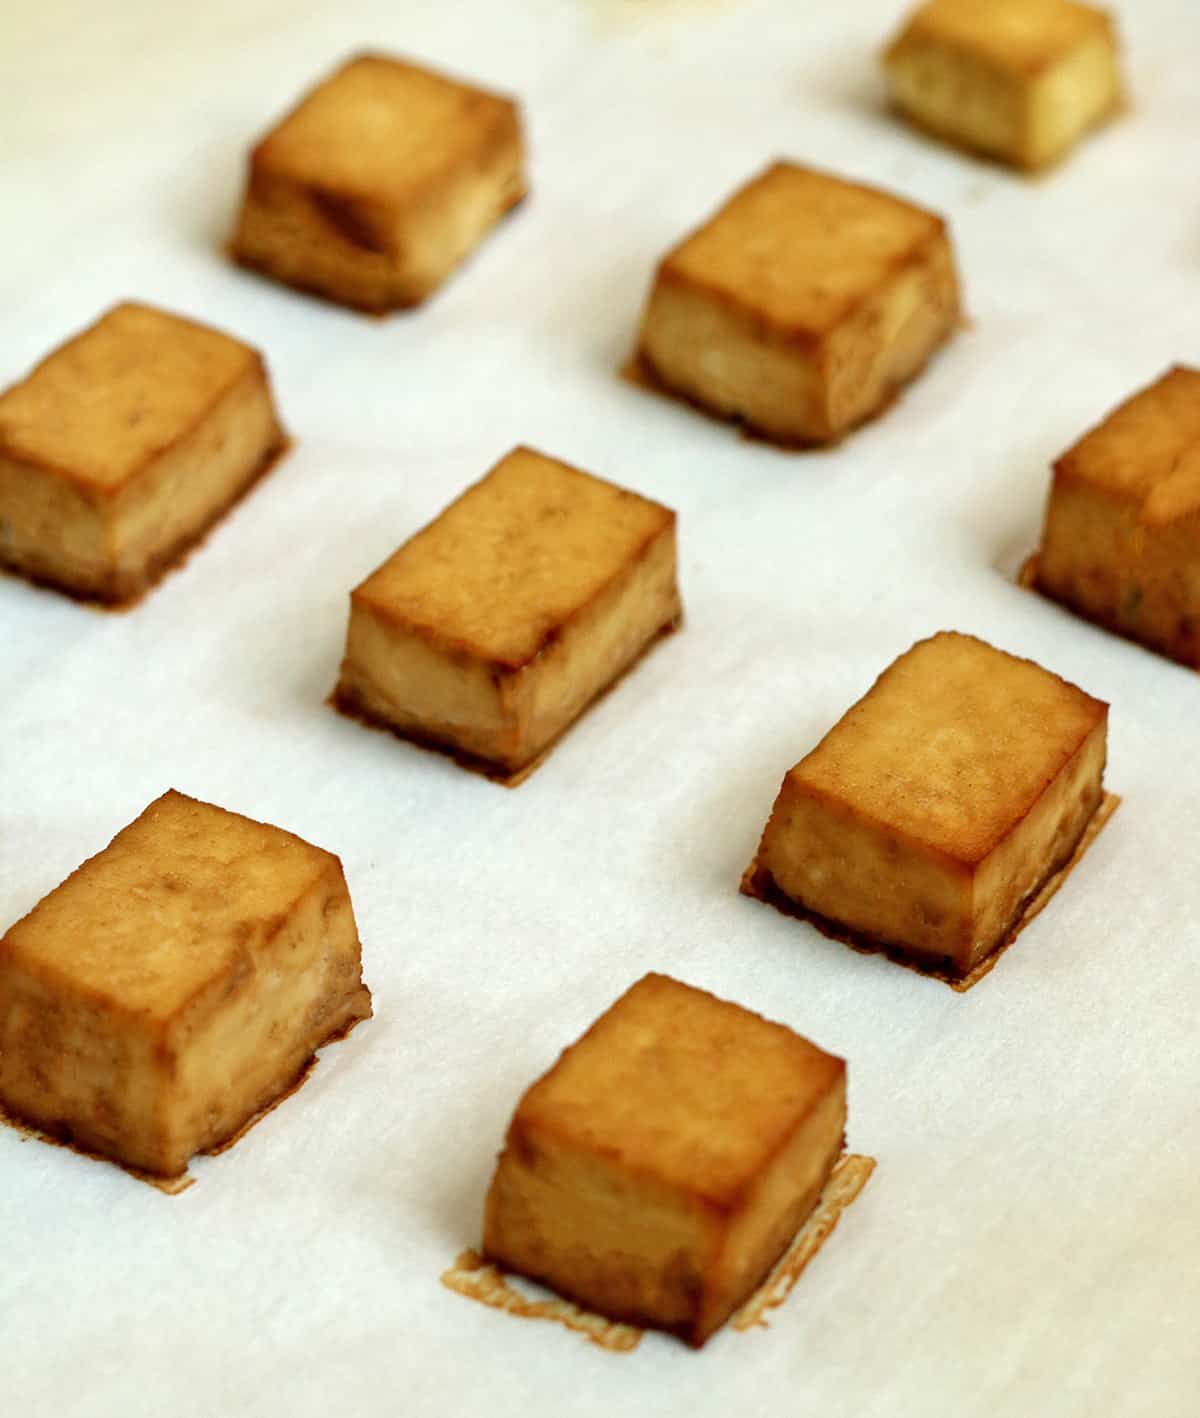 tofu baking on parchment paper